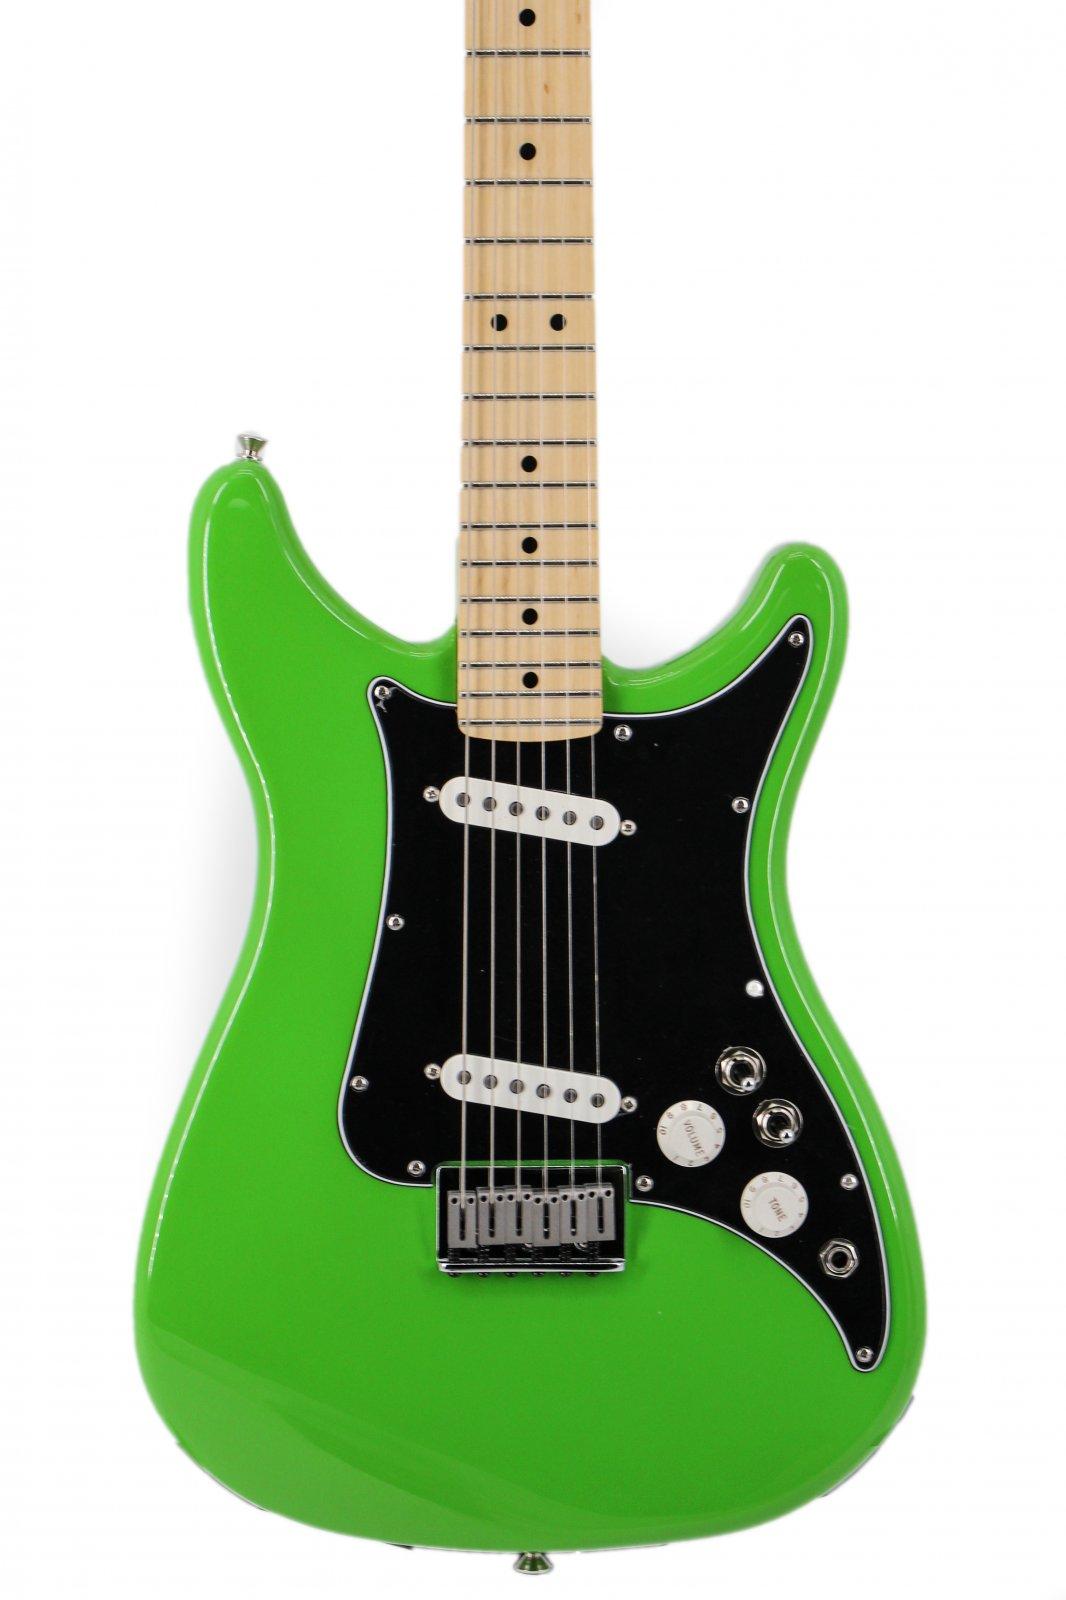 Fender Lead II Player Series Neon Green